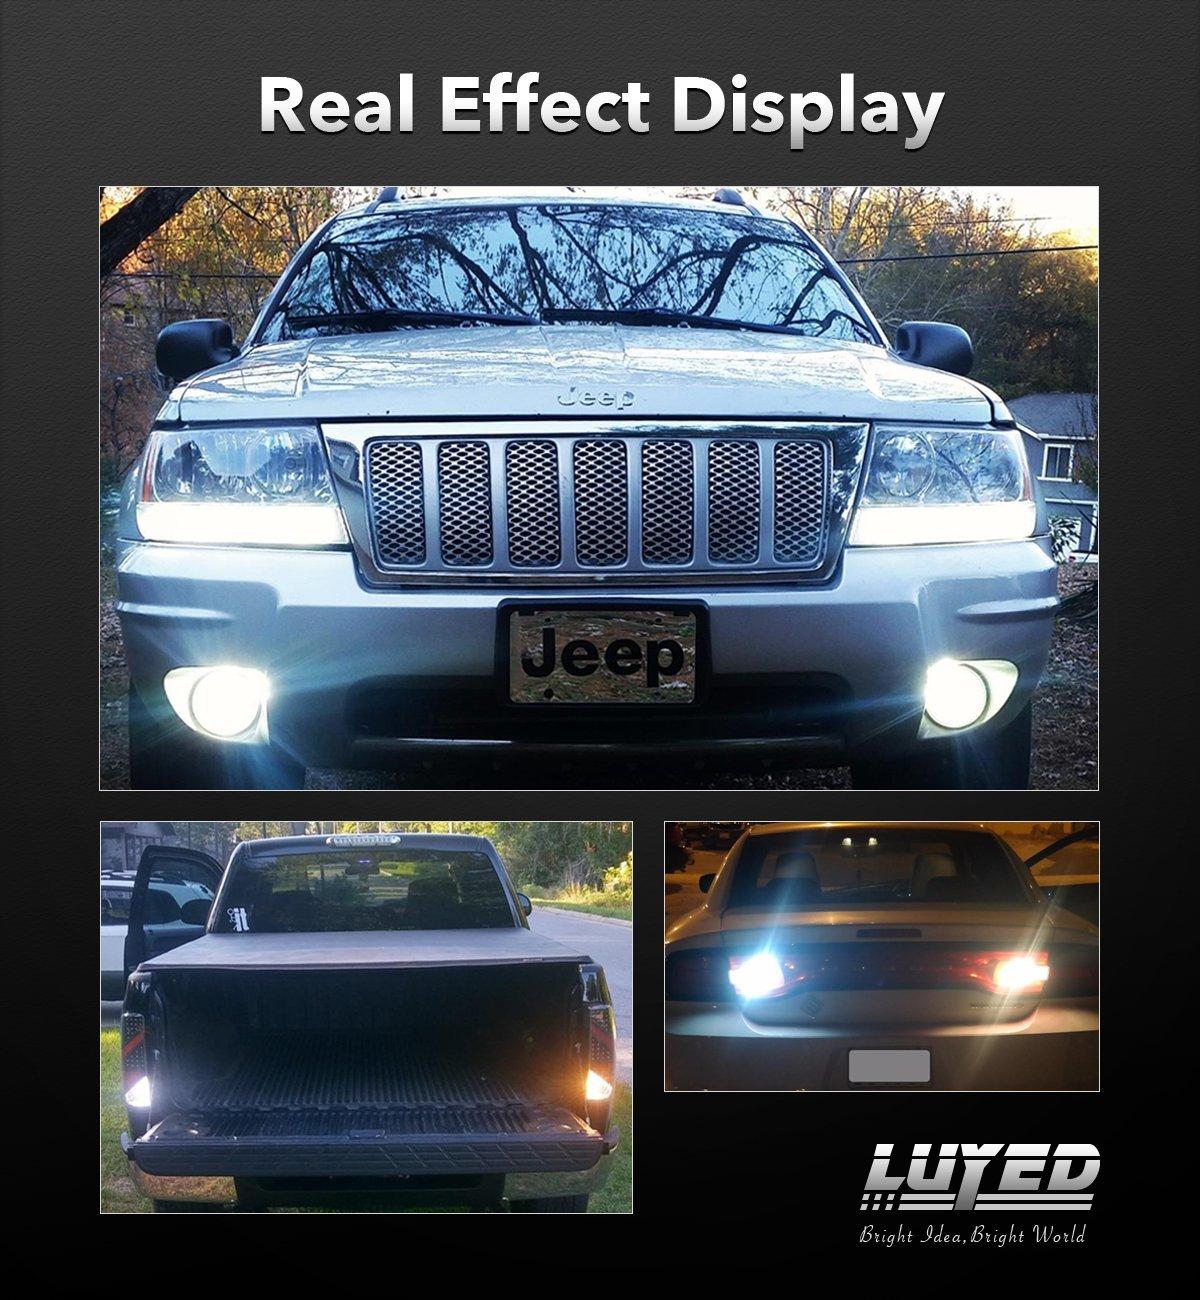 LUYED 2 x Super Bright 9-30v 3156 3057 3157 4157 LED Bulbs Used for Back Up Reverse Lights,Brake Lights,Tail Lights,Xenon White